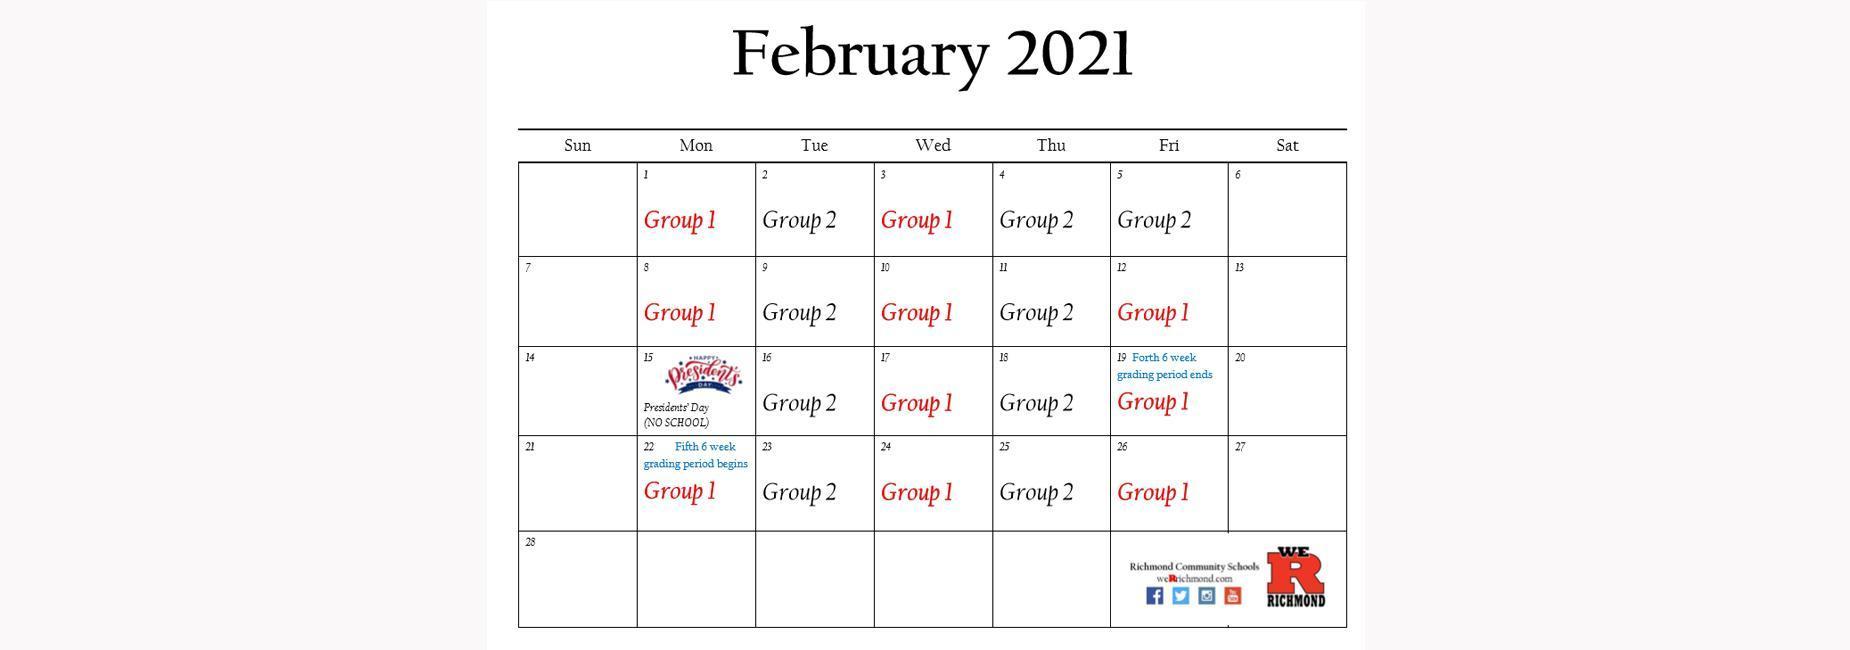 February 2021 Hybrid Schedule